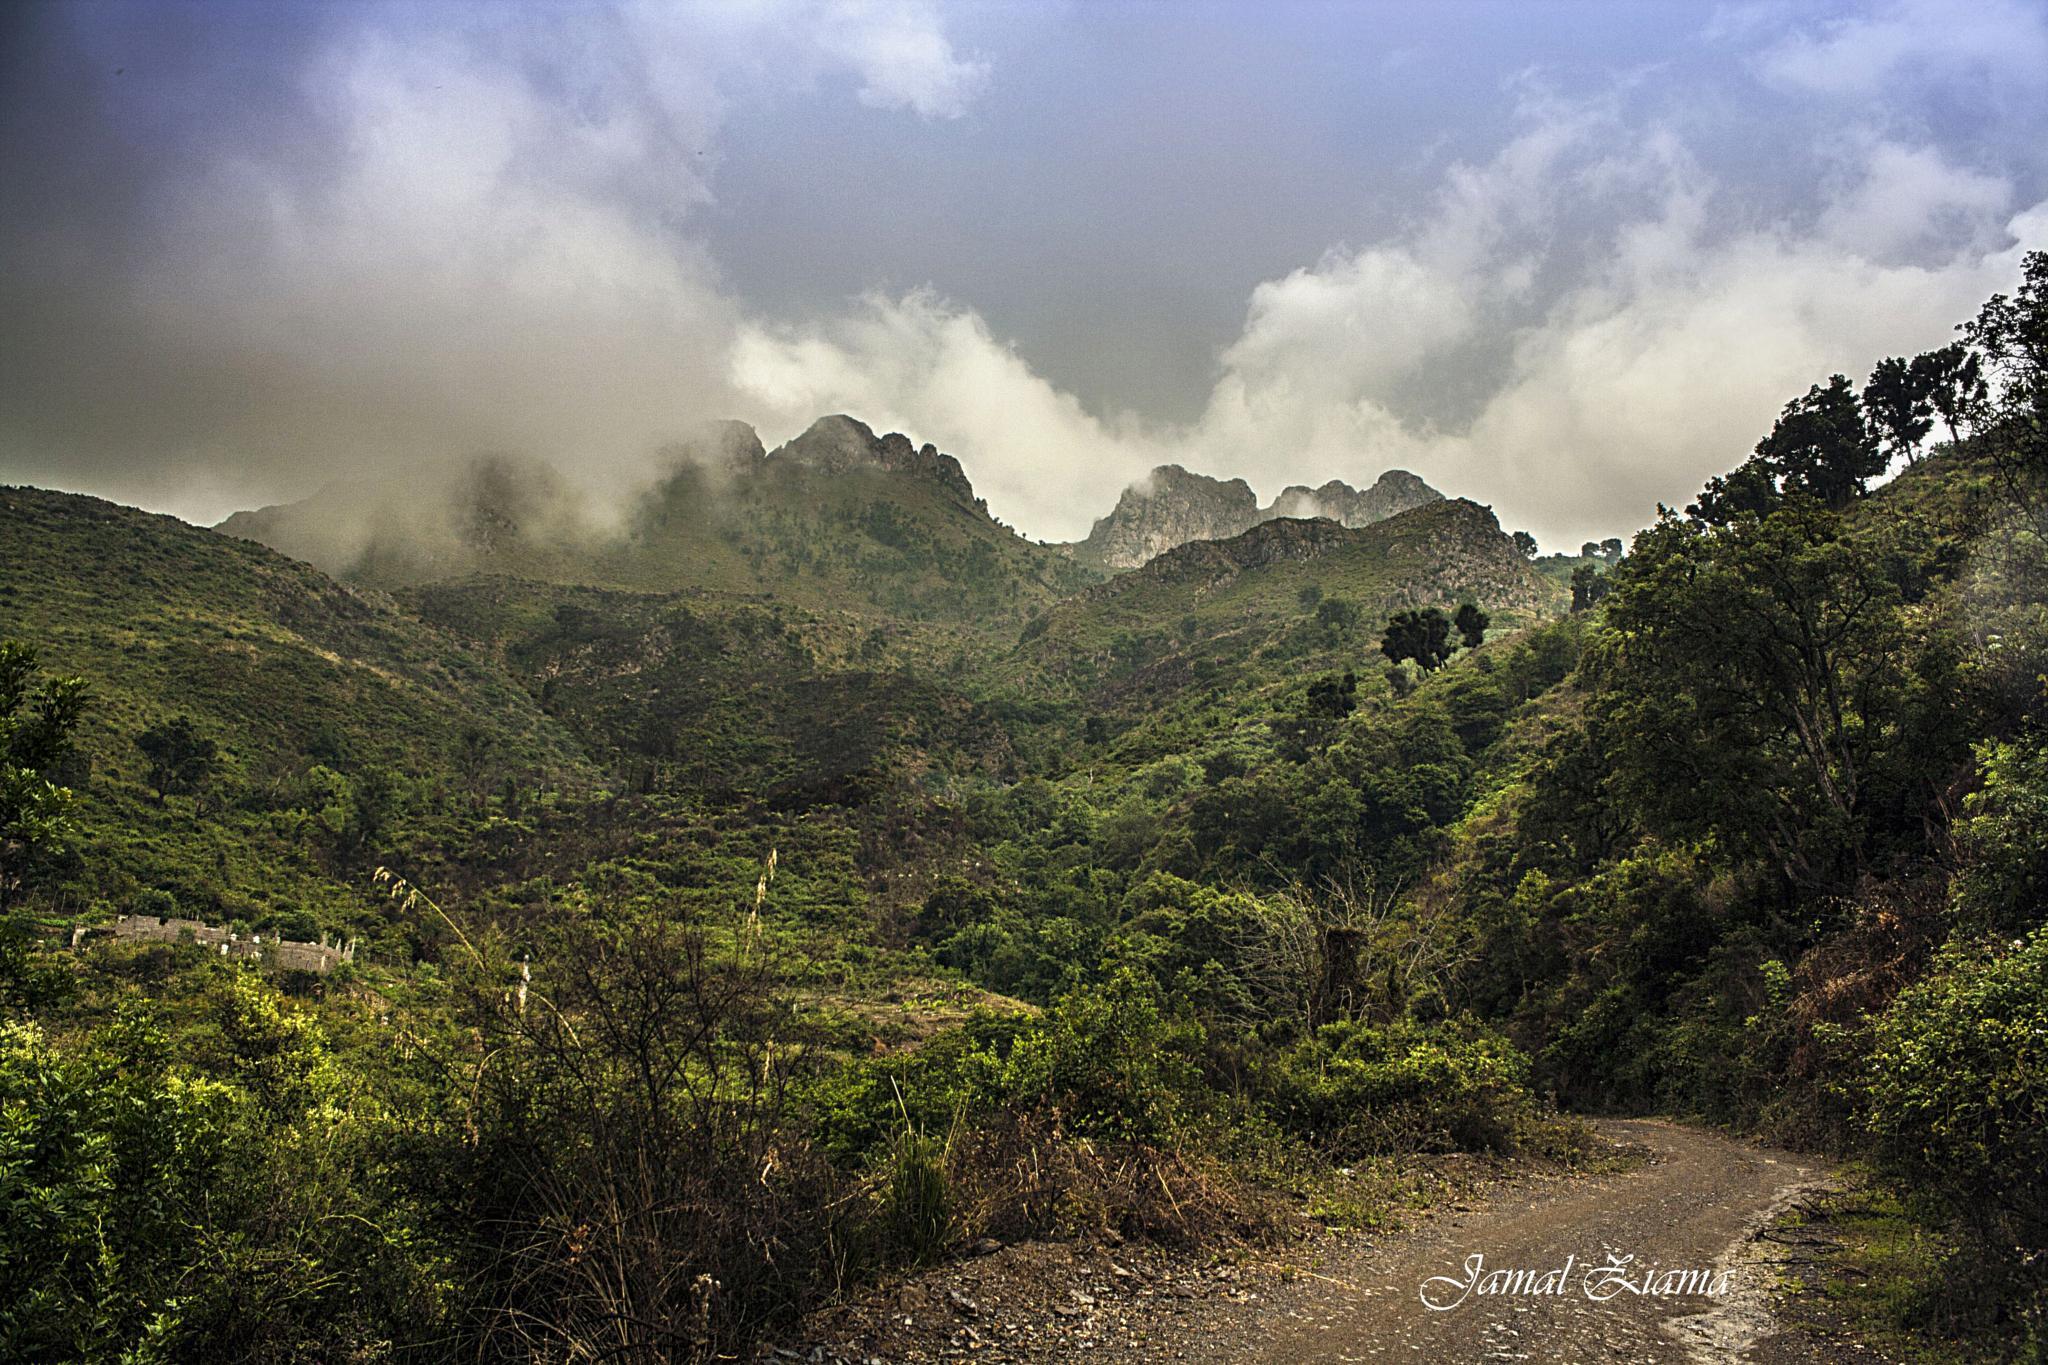 Mountain Road  by jamalziama